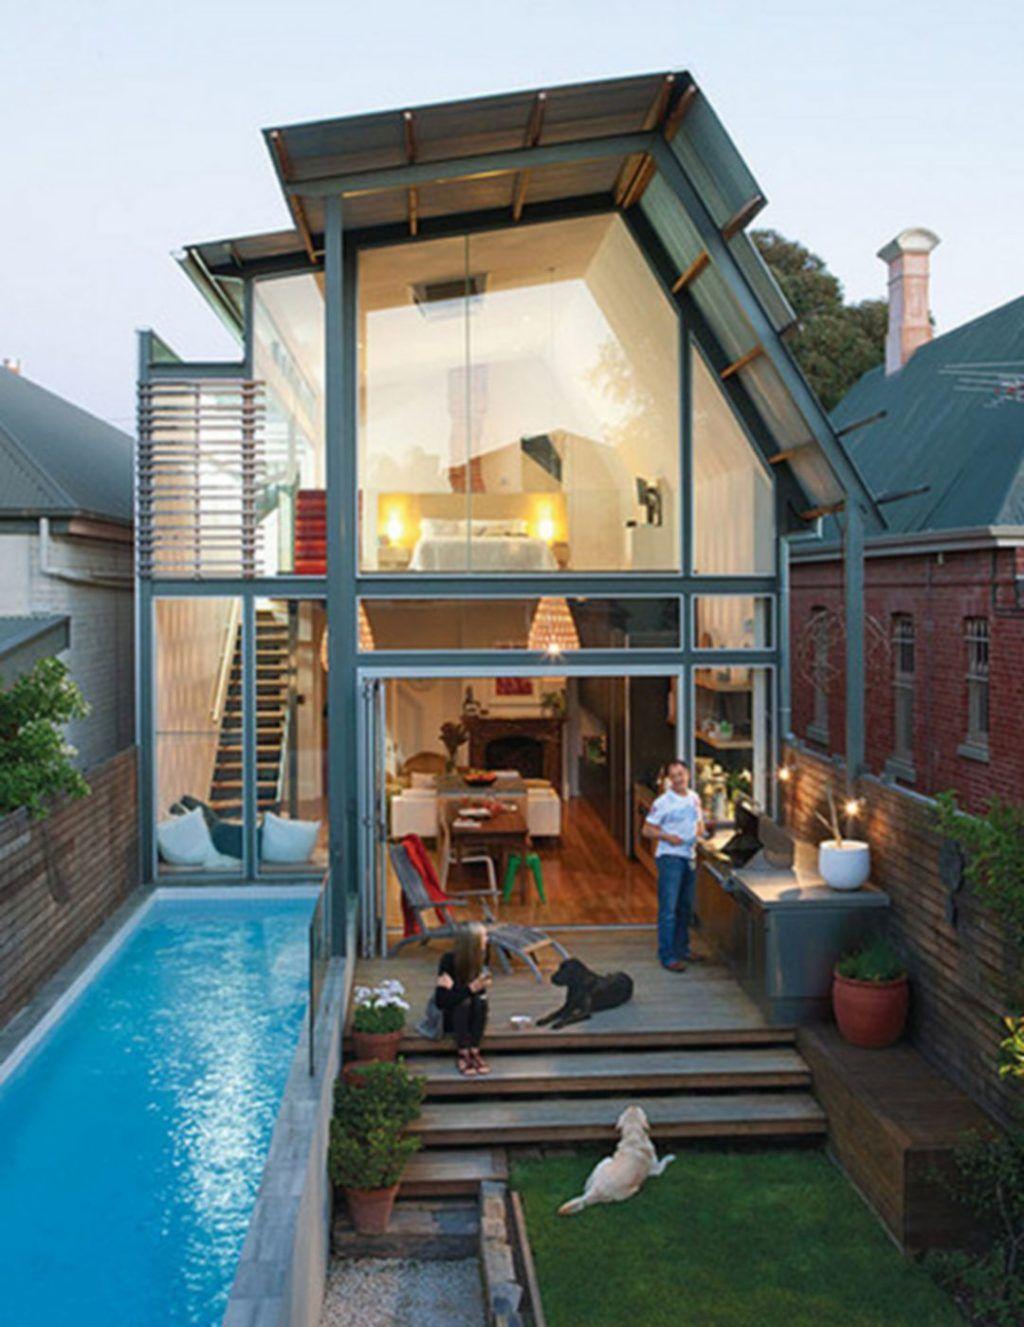 25 Gorgeous Small Swimming Pool For Small Backyard Ideas Moolton Pool Designs Small Backyard Pools Swimming Pool Designs